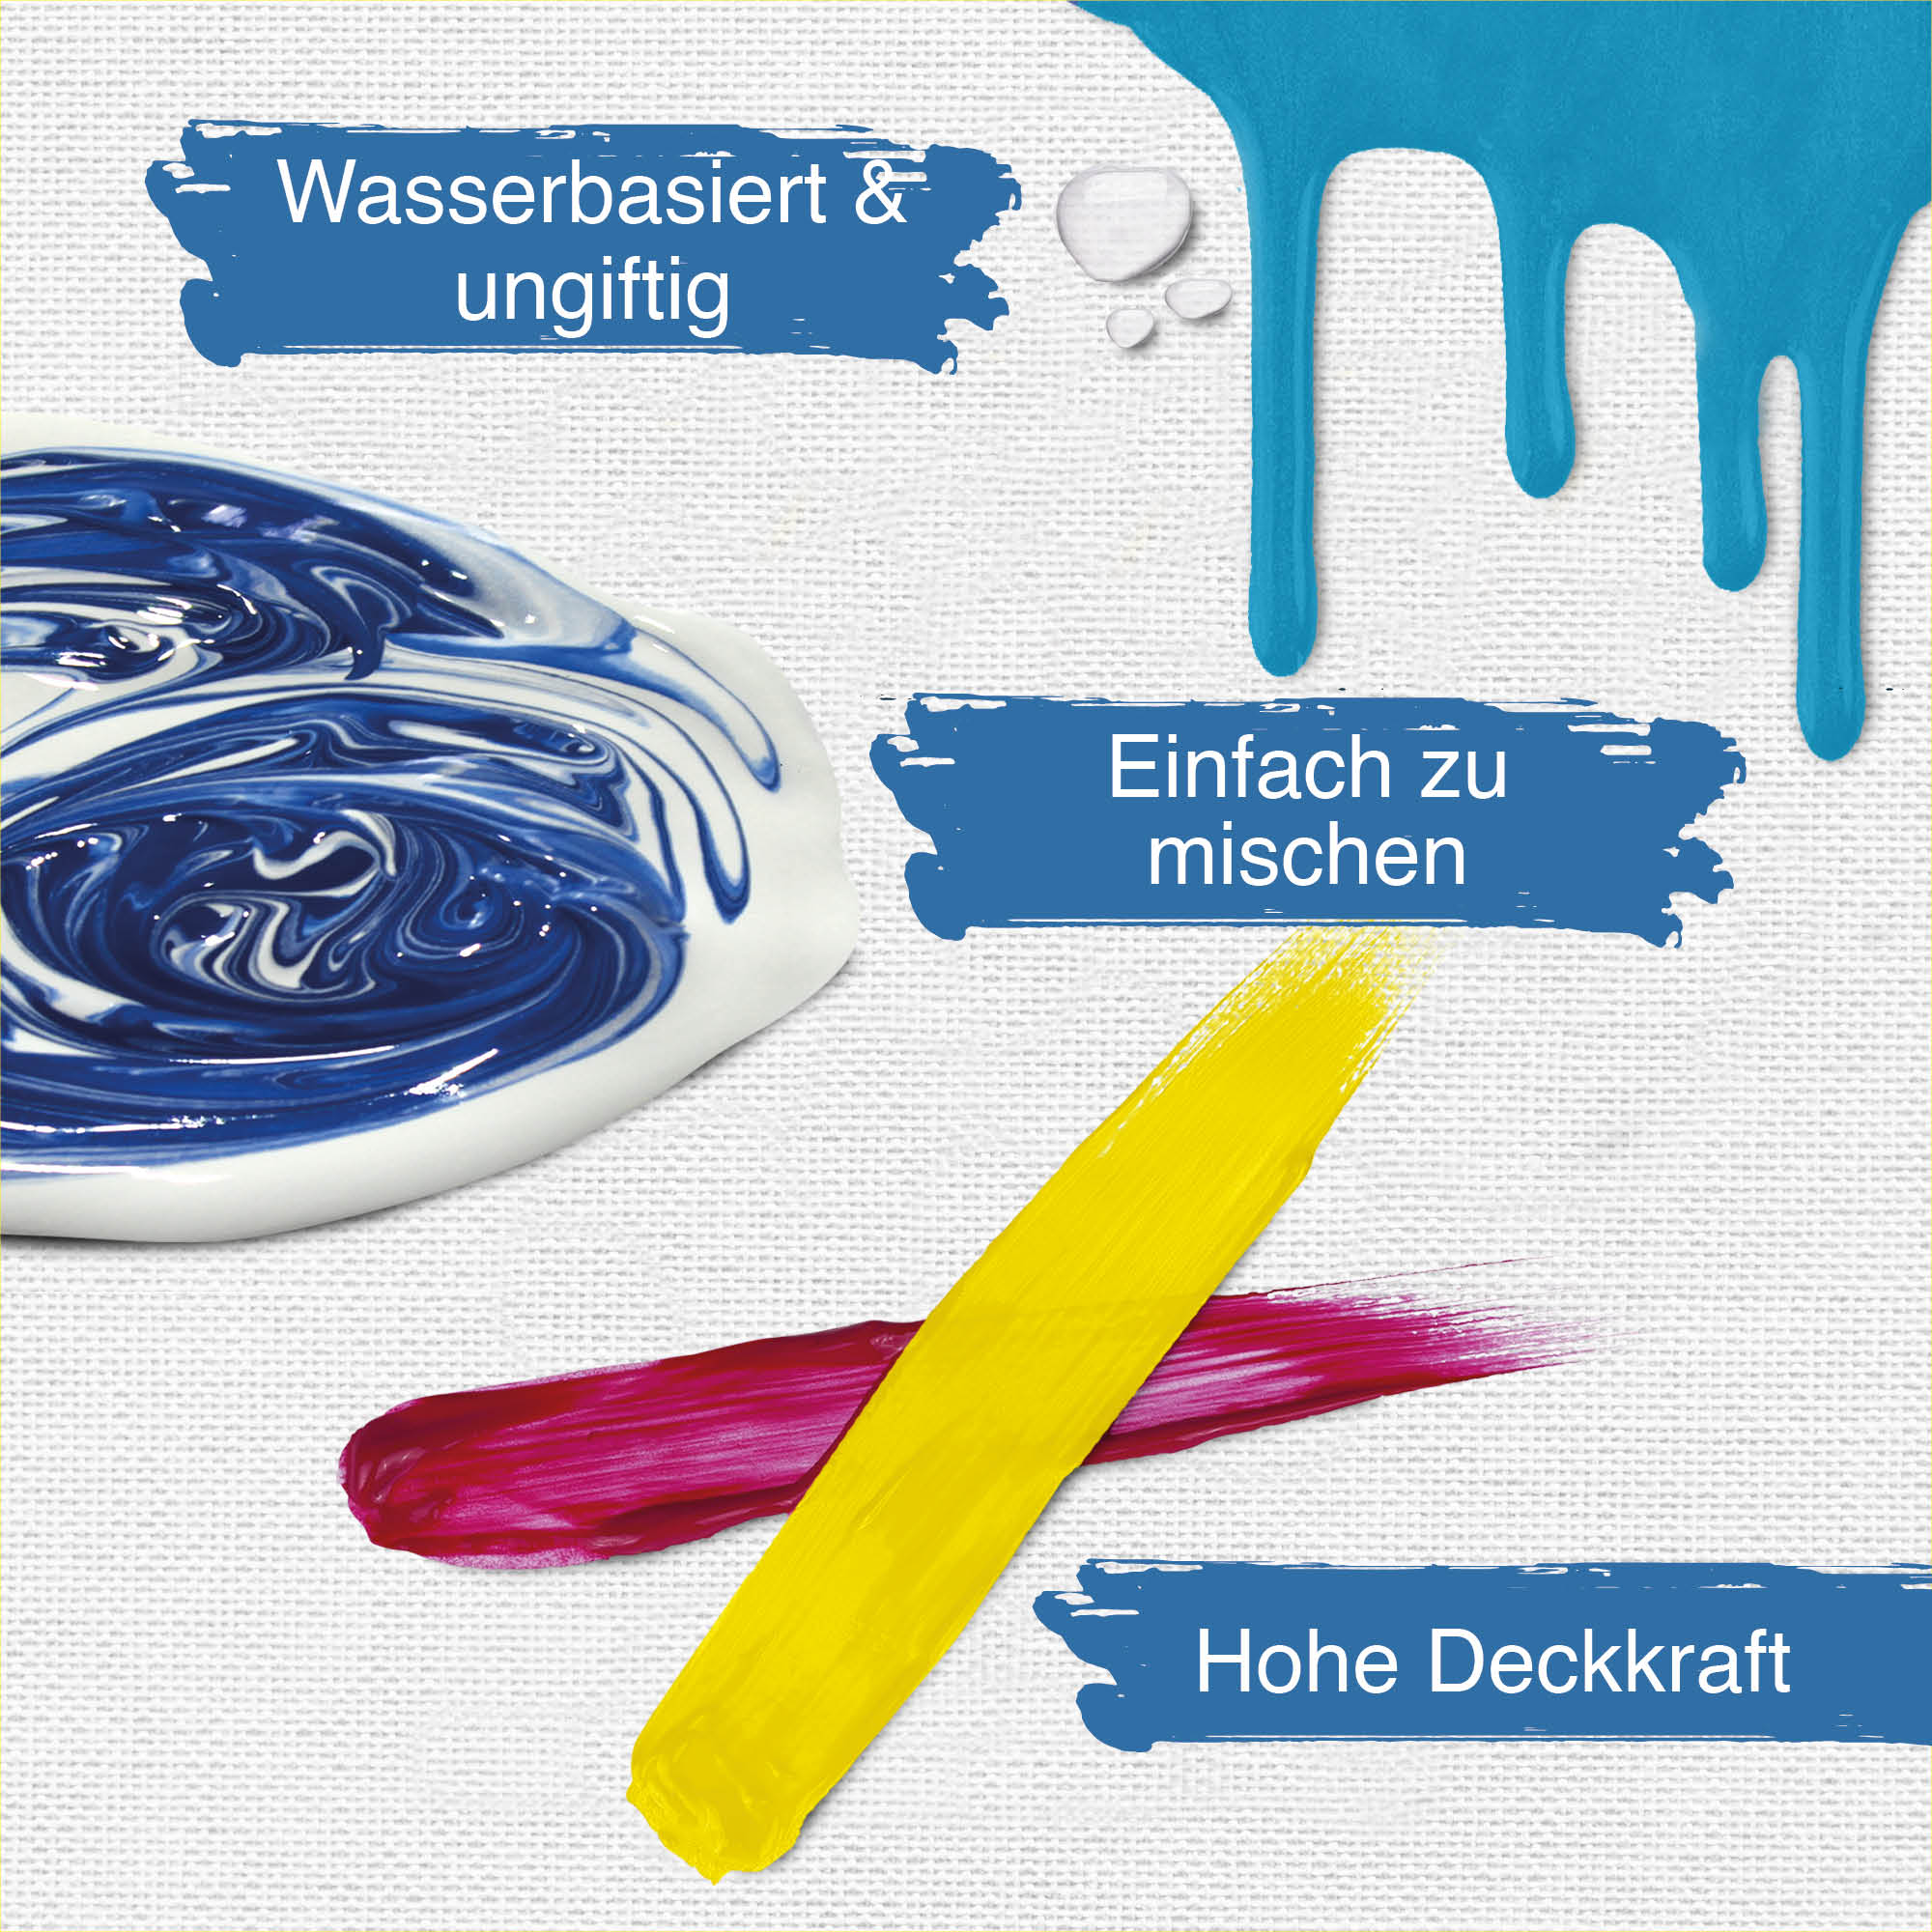 acrylfarben set mit 24 farben 120 ml malfarbe acrylfarbe k nstlerfarbe malen ebay. Black Bedroom Furniture Sets. Home Design Ideas